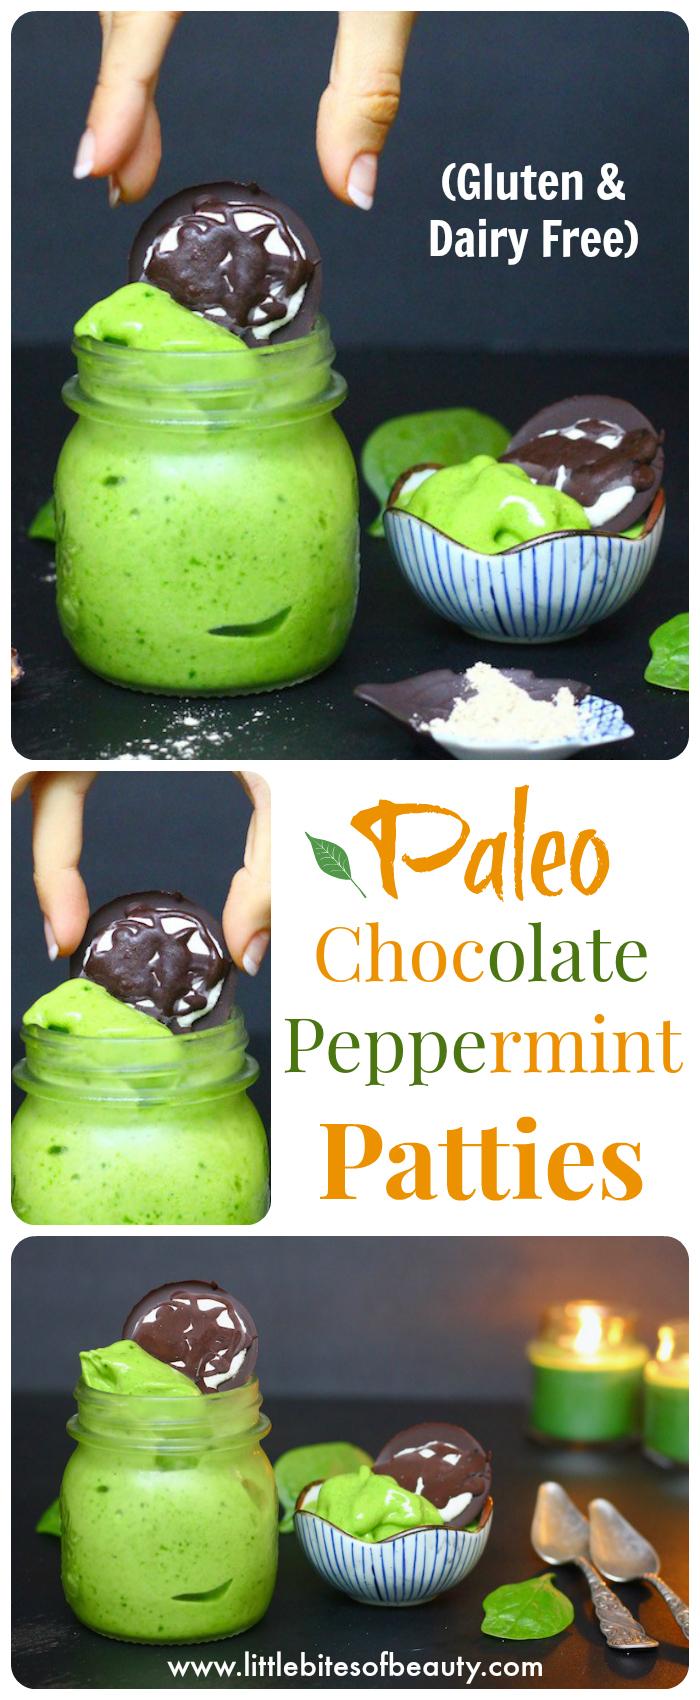 Paleo Chocolate Peppermint Patties